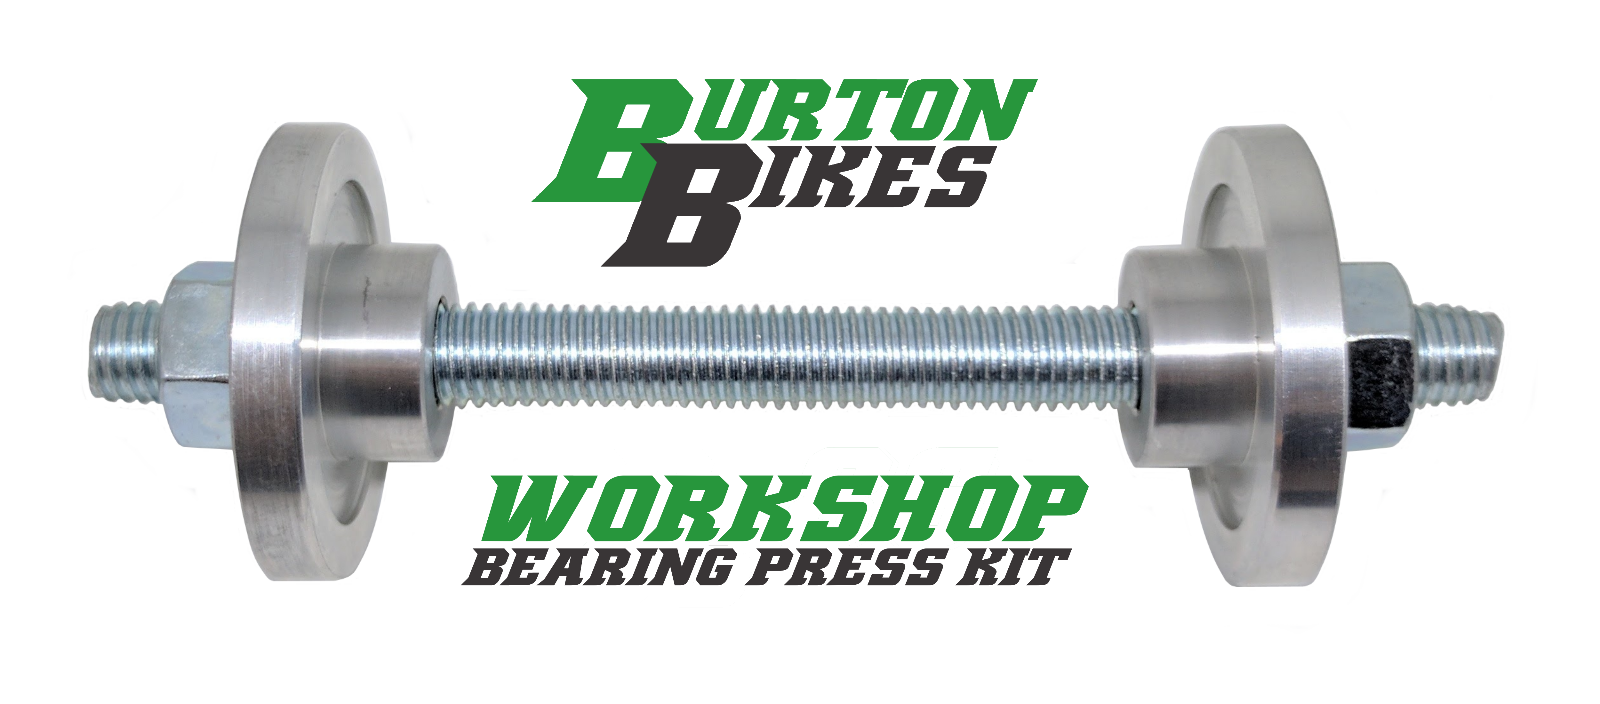 Burton MOTO OFFICINA movimento centrale PRESS Tool Kit, BB30, BB90, BB86, PF30, GXP